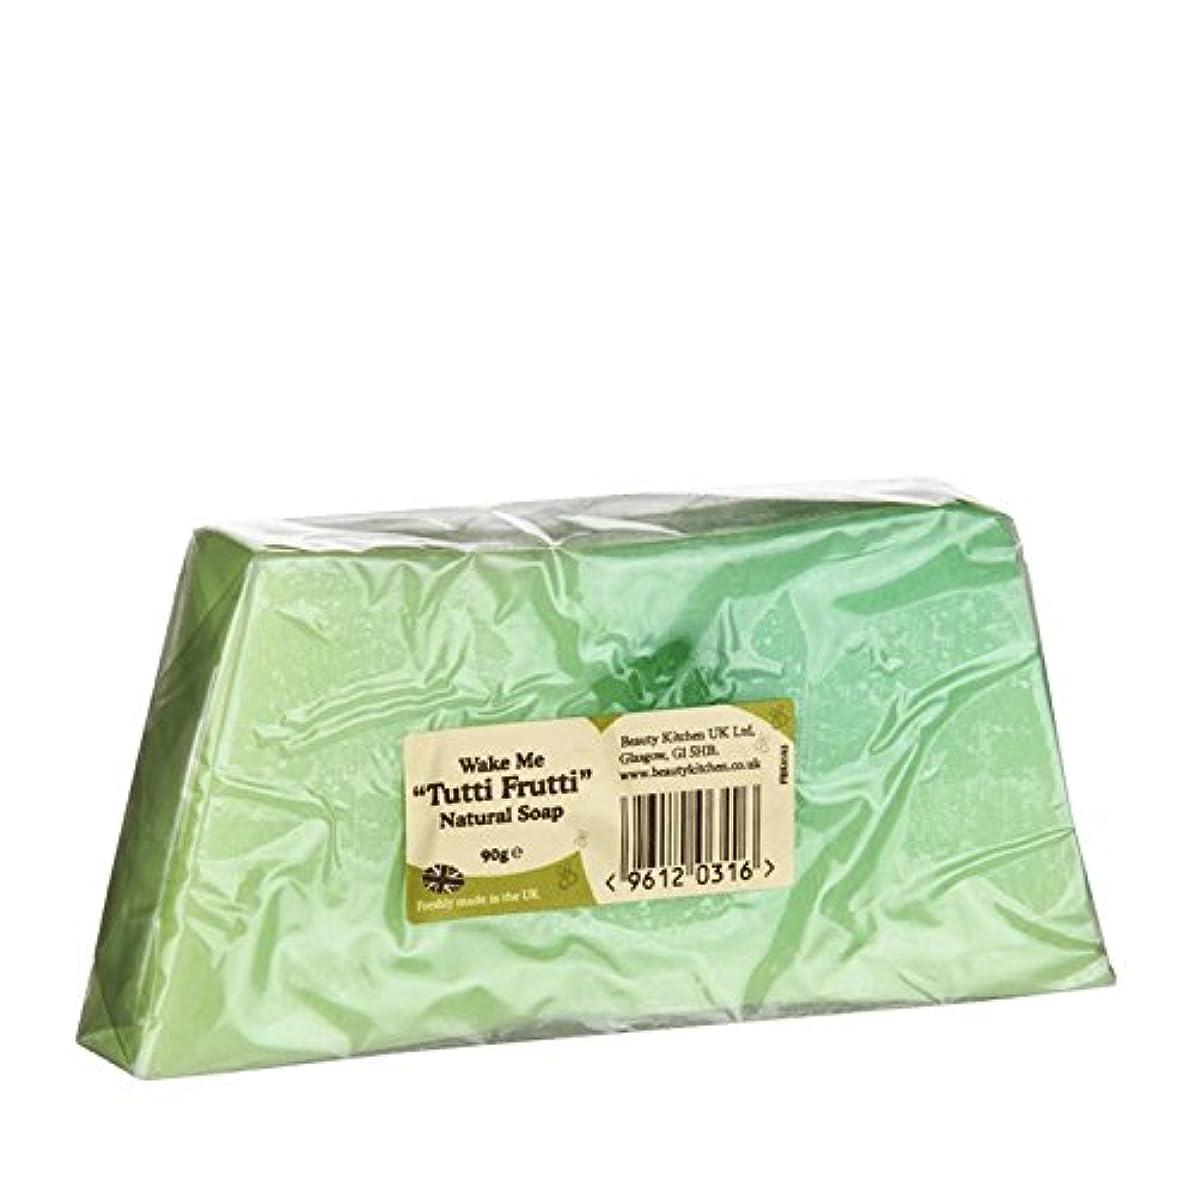 Beauty Kitchen Wake Me Tutti Frutti Natural Soap 90g (Pack of 2) - 美しさのキッチンは私トゥッティフルッティの天然石鹸90グラムウェイク (x2) [並行輸入品]